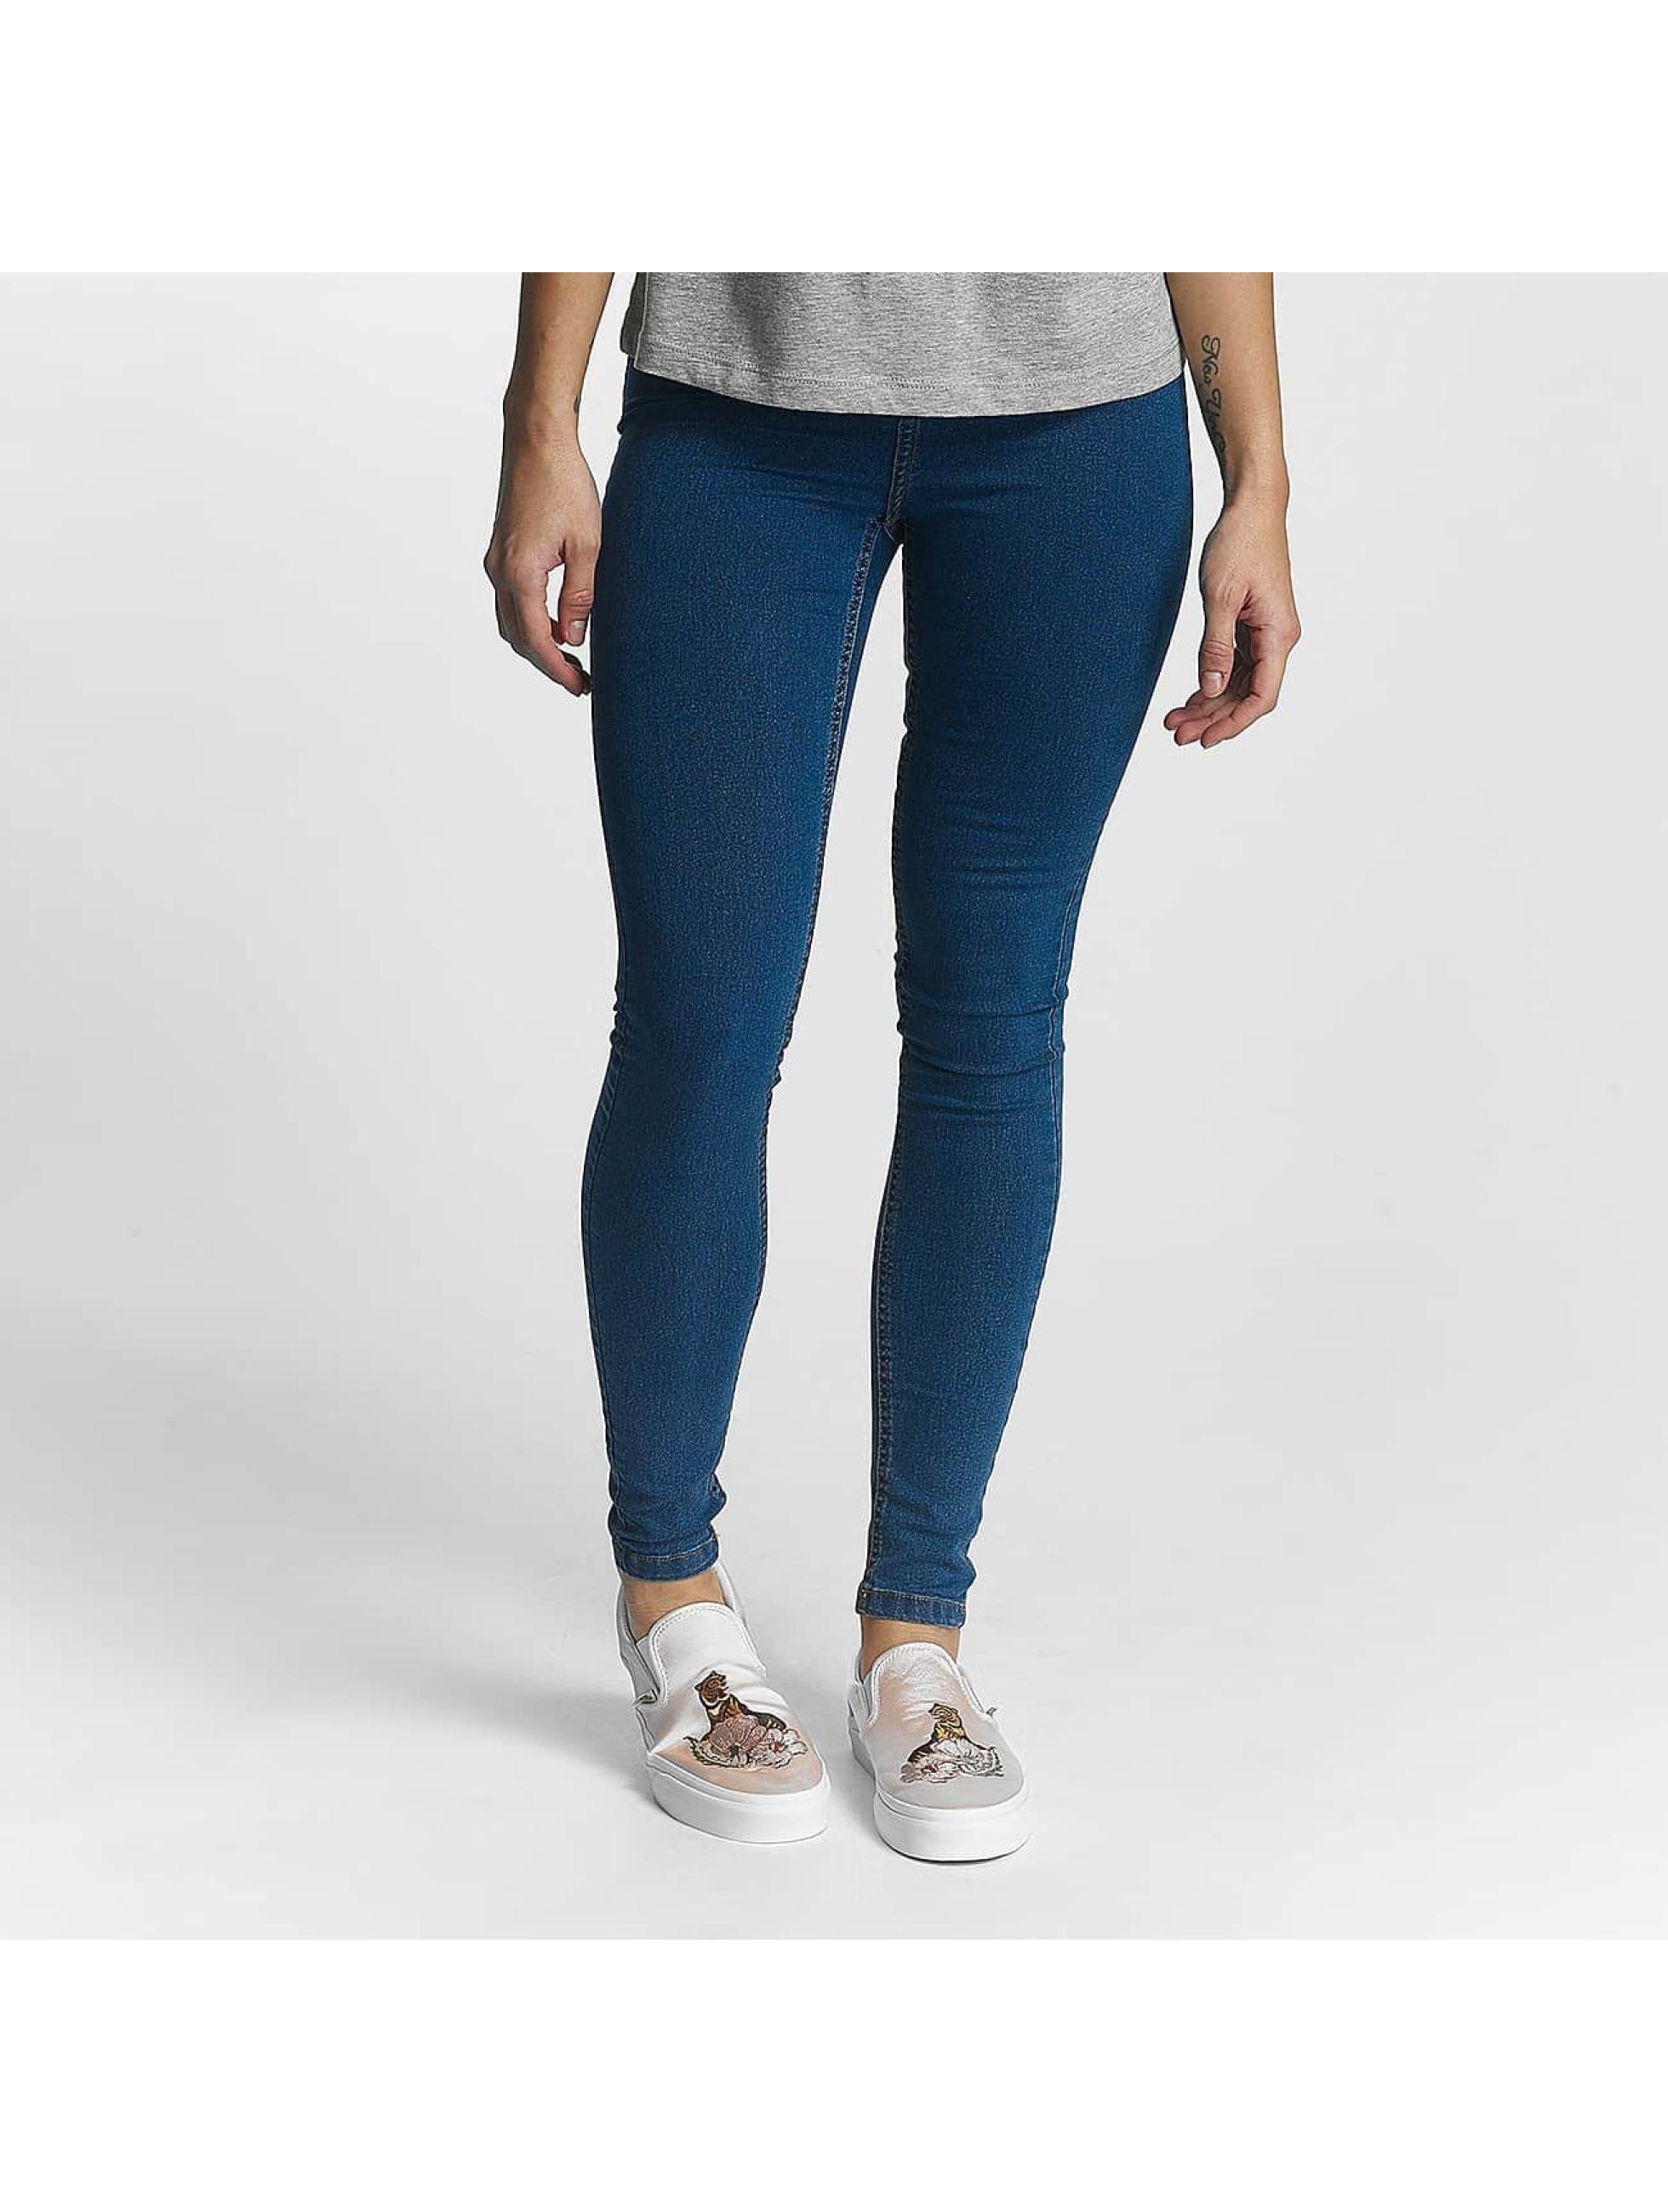 Noisy May Frauen High Waist Jeans nmGreat Lexi in blau